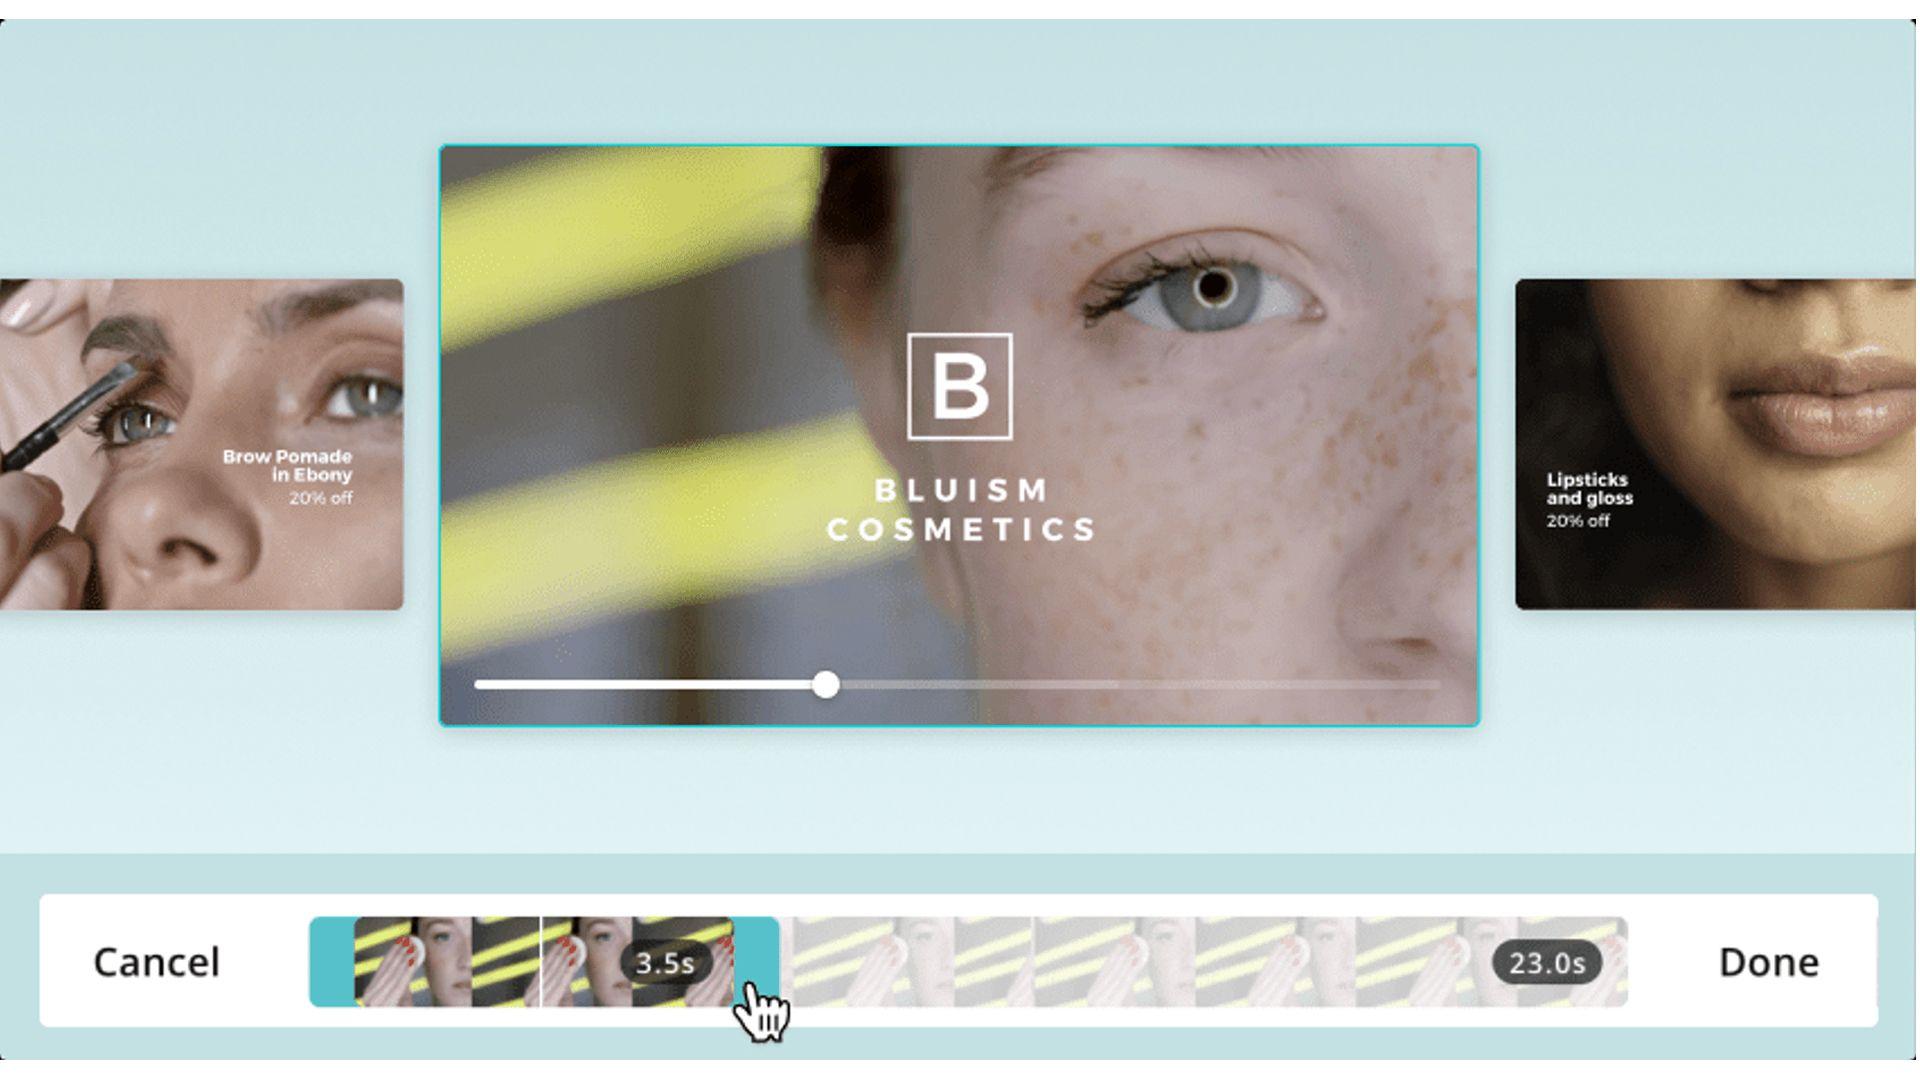 Captura de tela do editor de vídeo online Canva